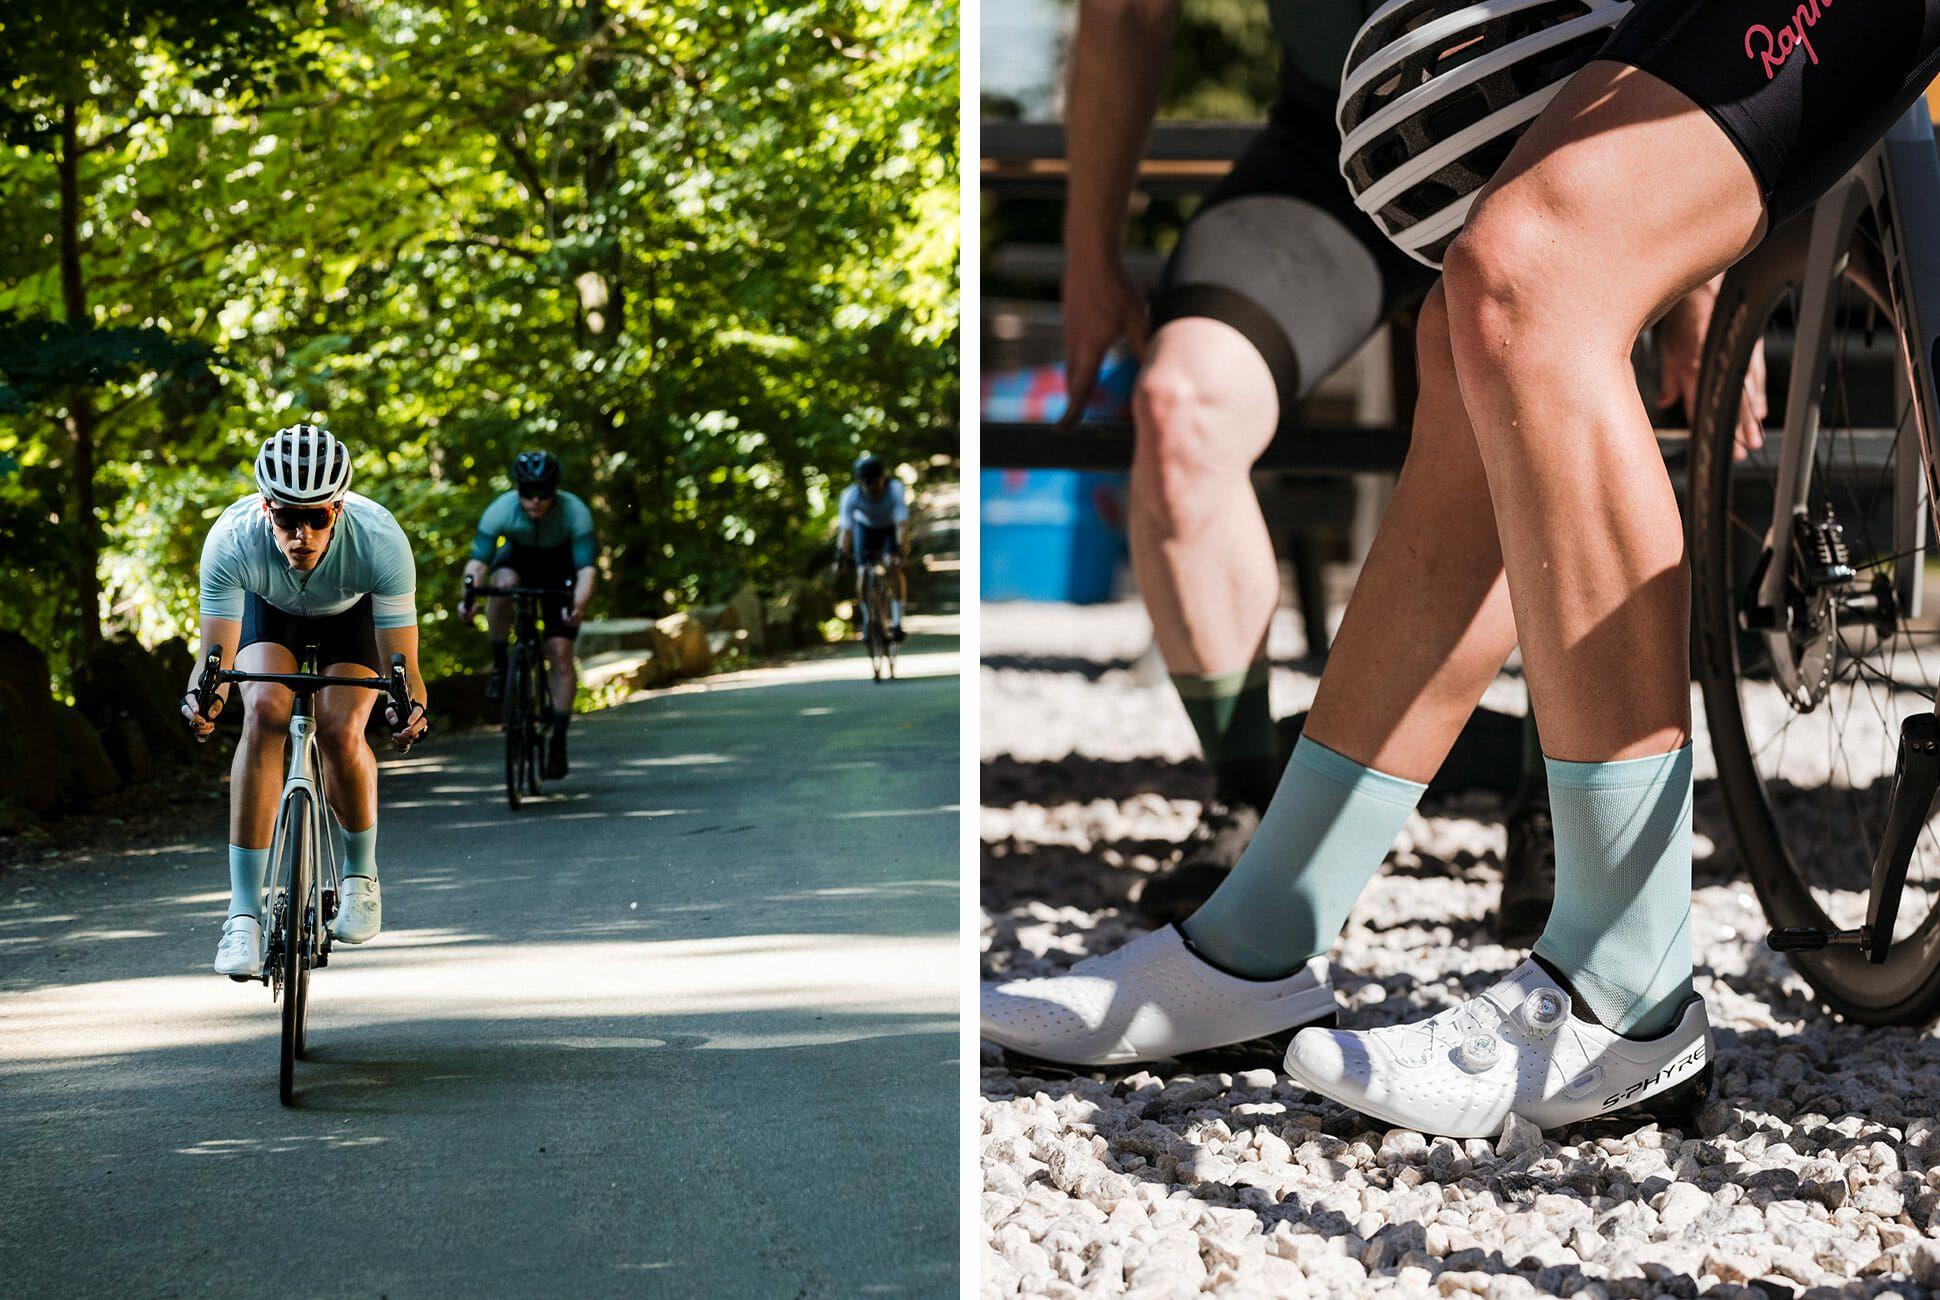 Summer-Cycling-Kits-2018-gear-patrol-af-slide-6